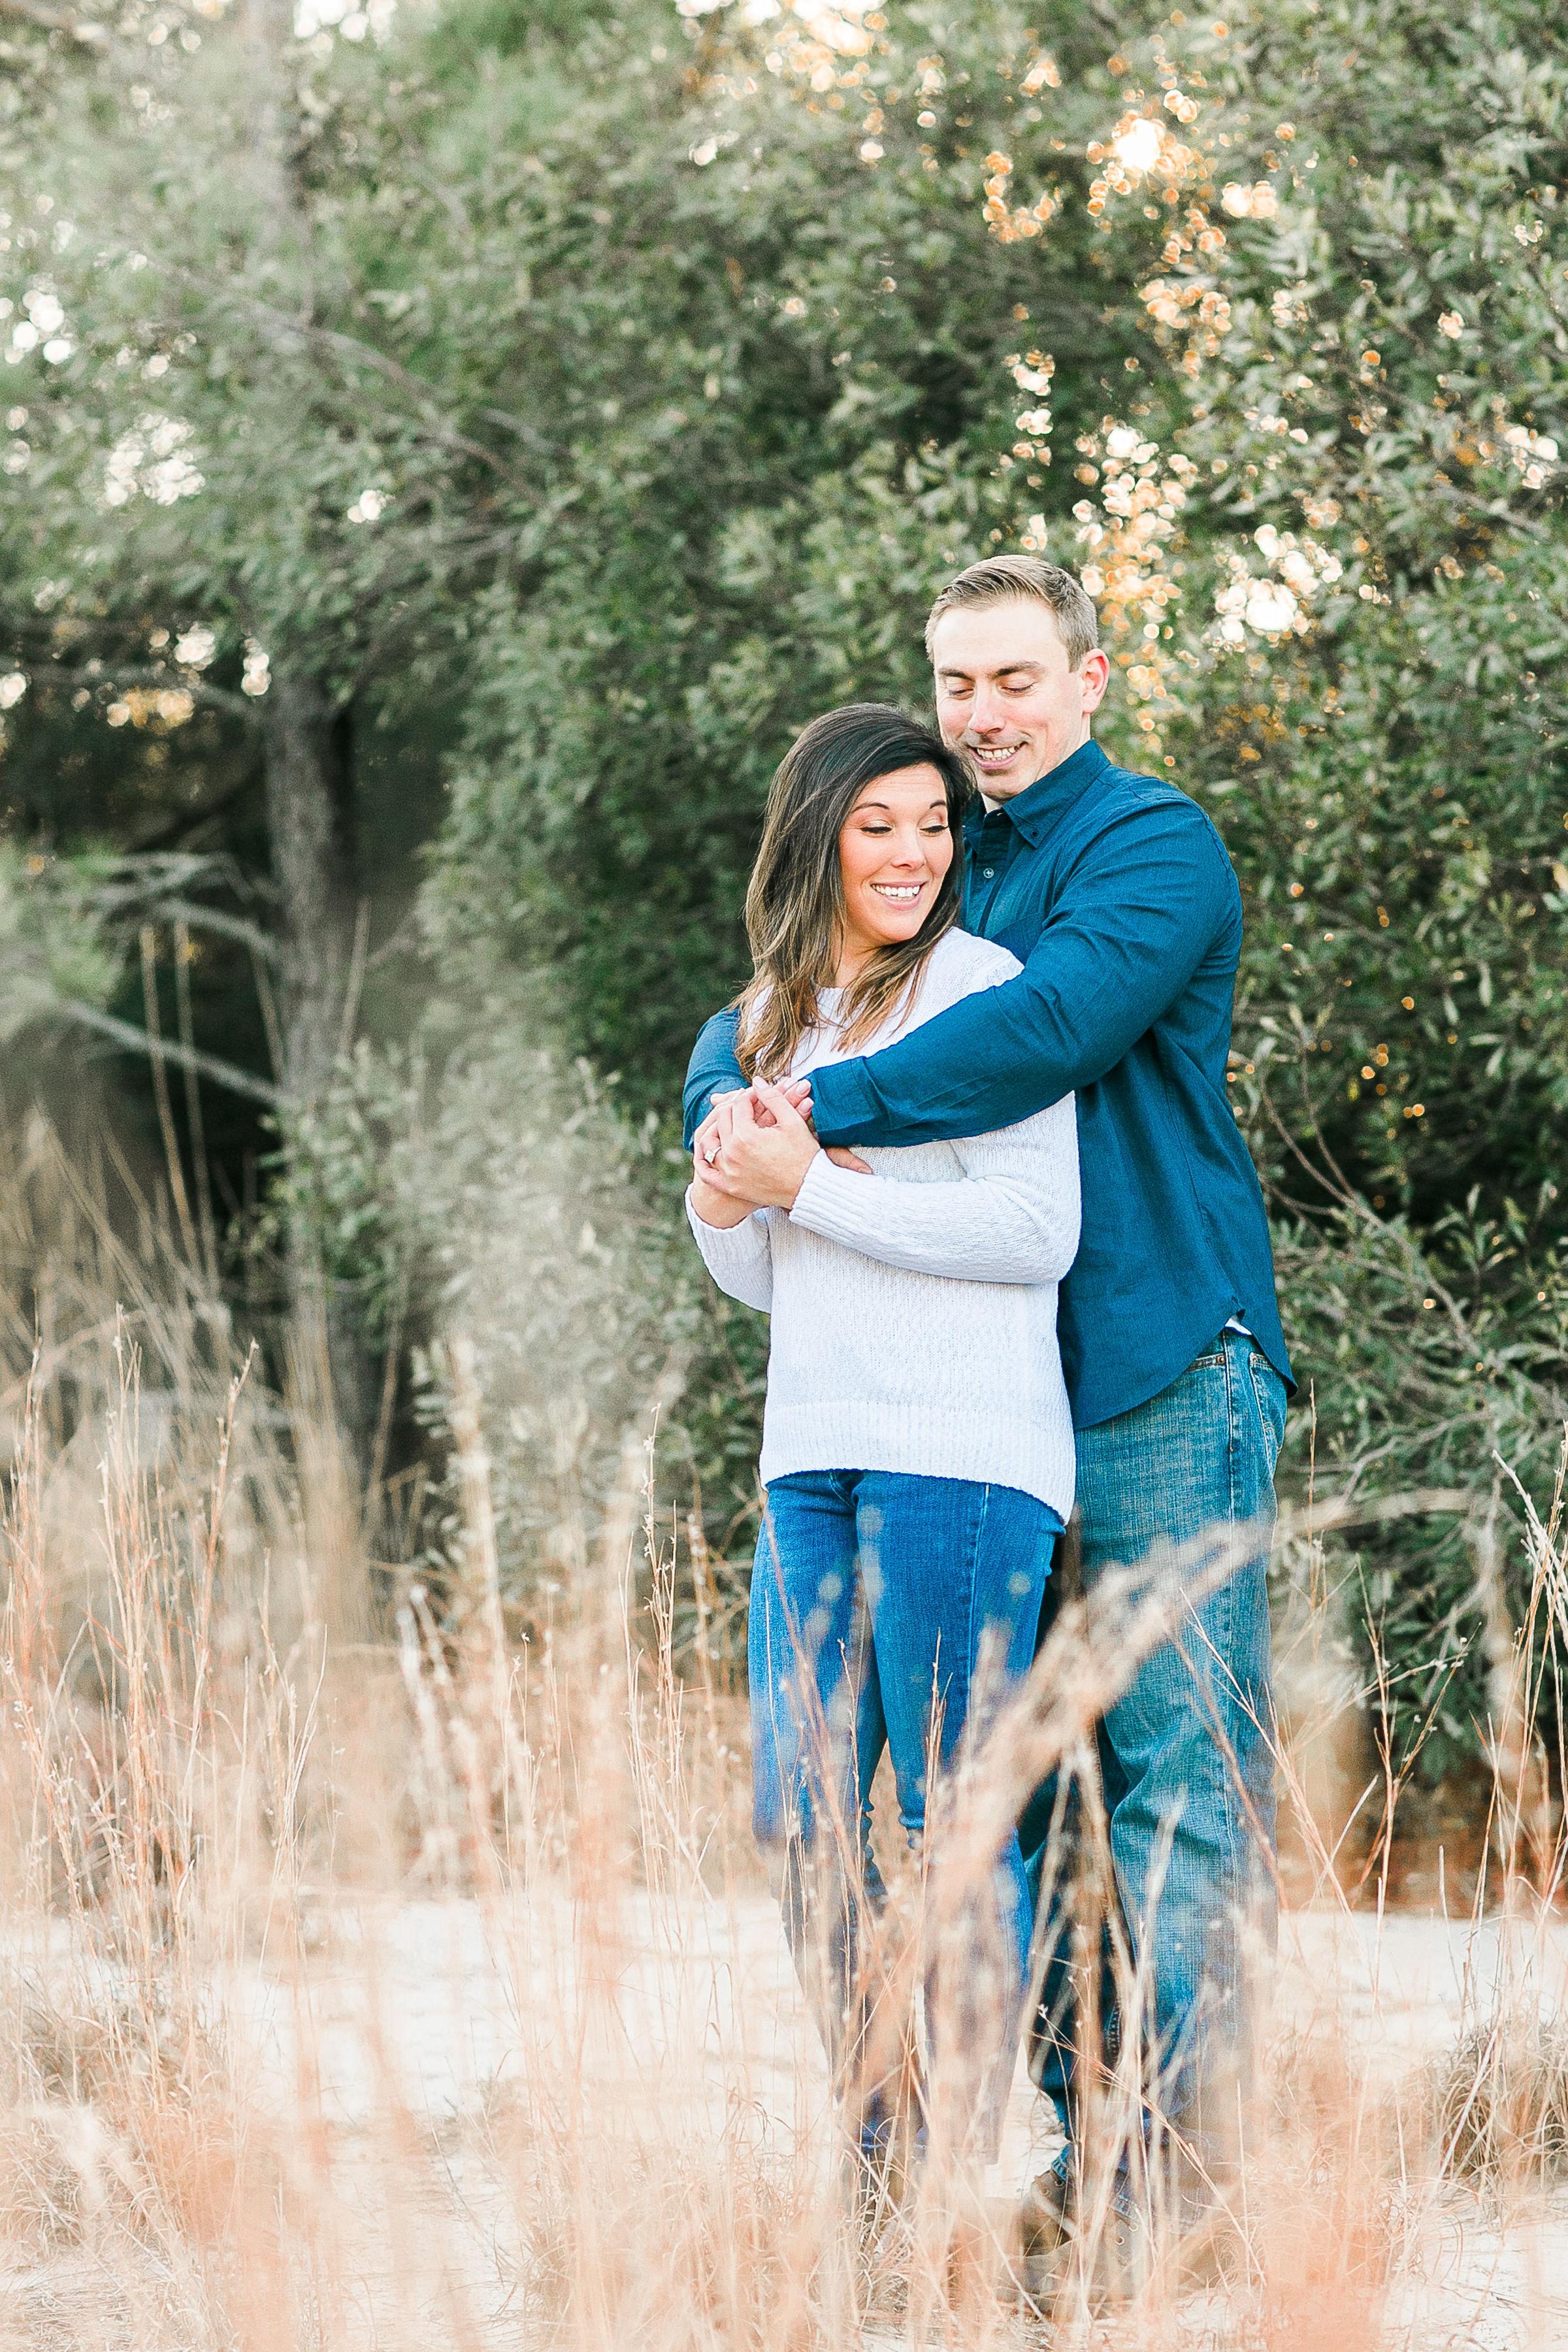 Nicole&Dustin_Engaged-110.jpg